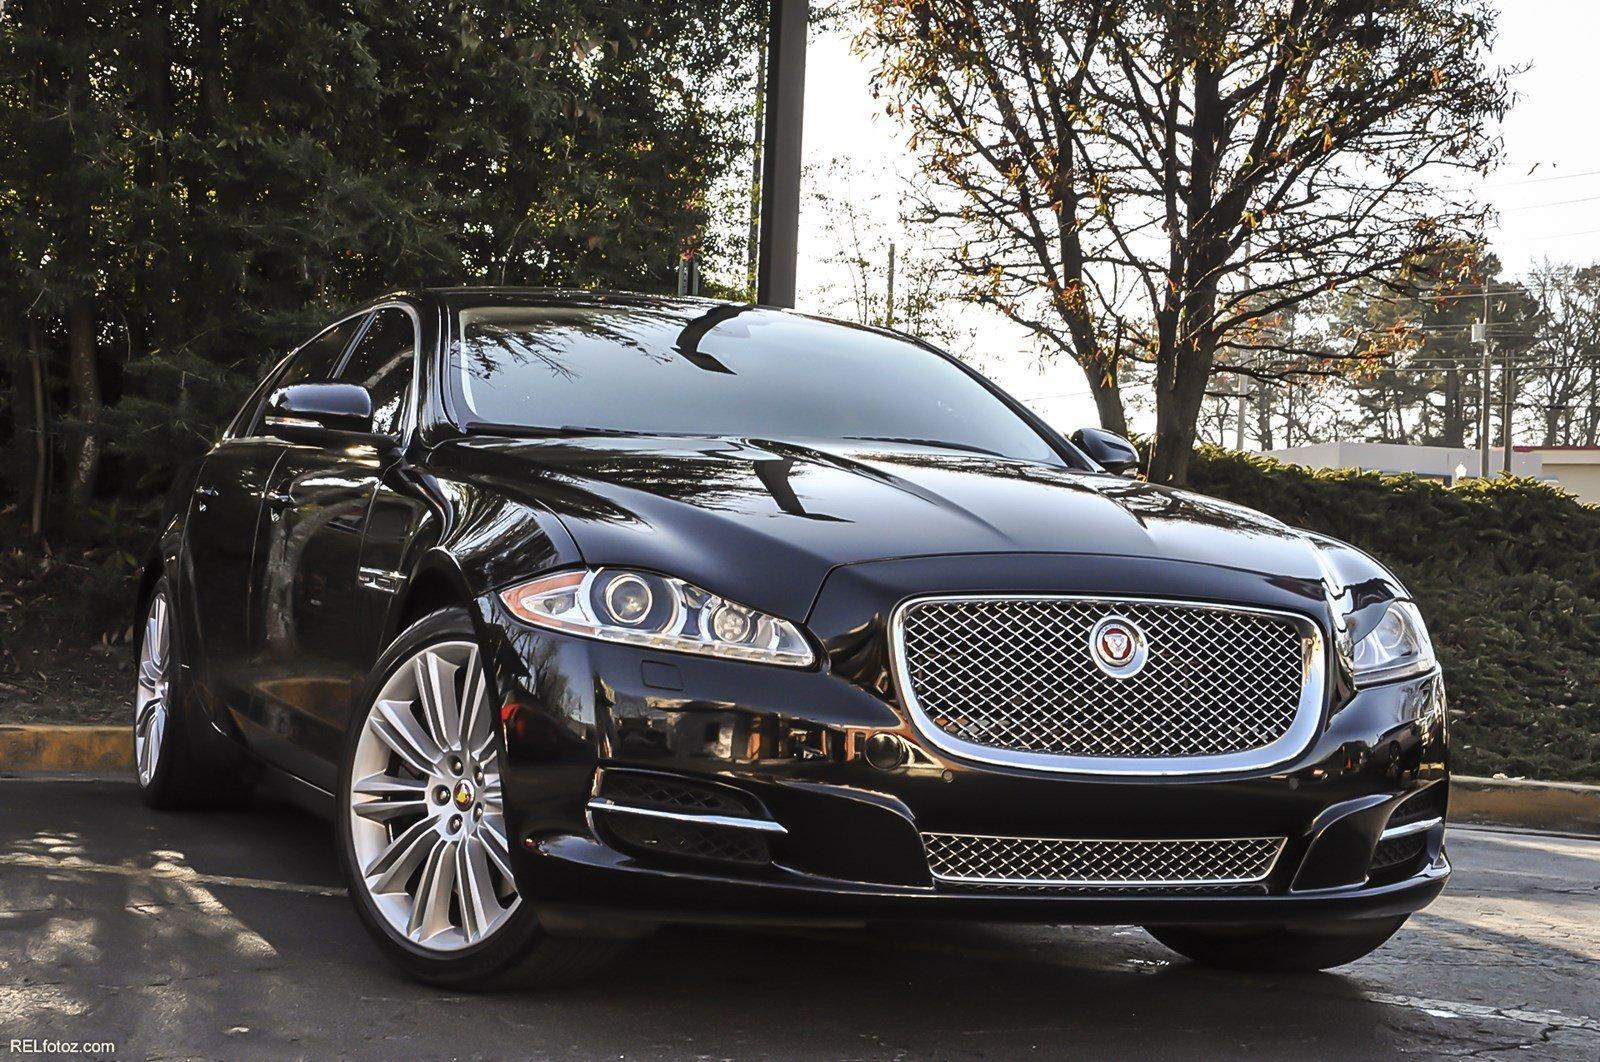 automotive l com xjr photos xjl stack xj center assorted series photo angled jaguar